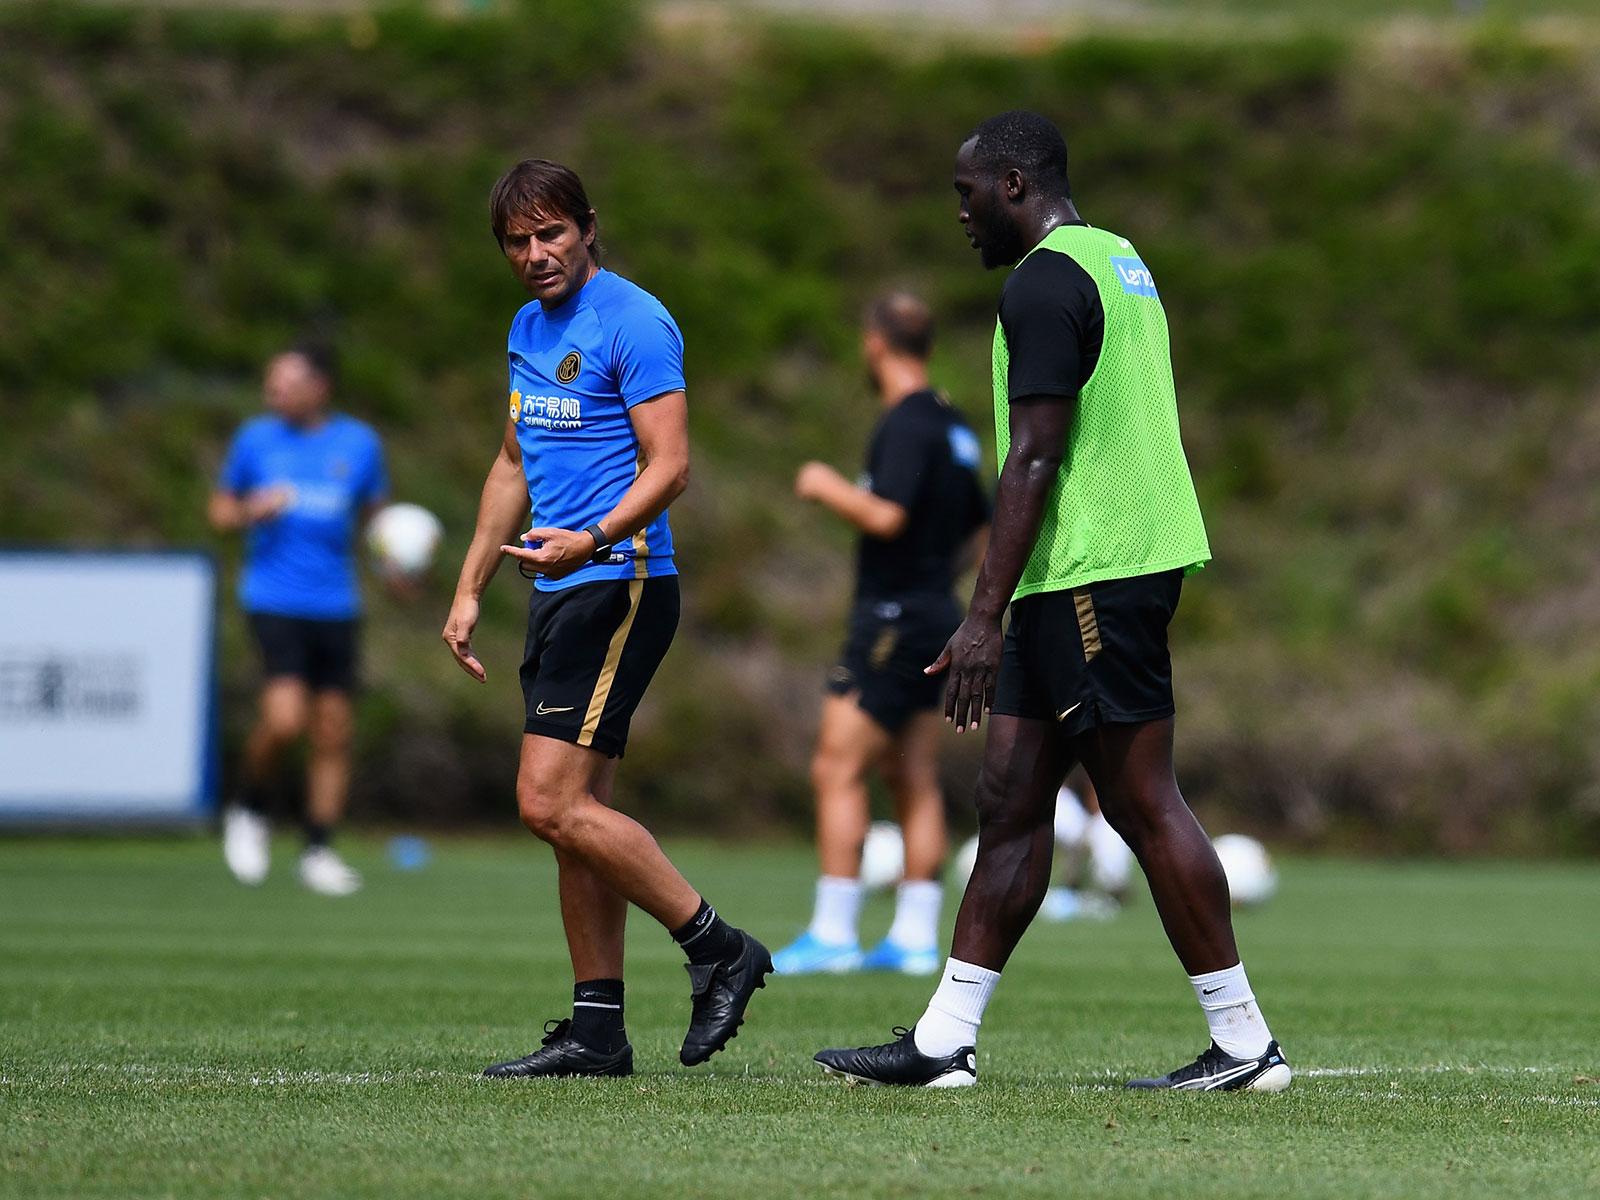 Antonio Conte and Romelu Lukaku are new faces at Inter Milan